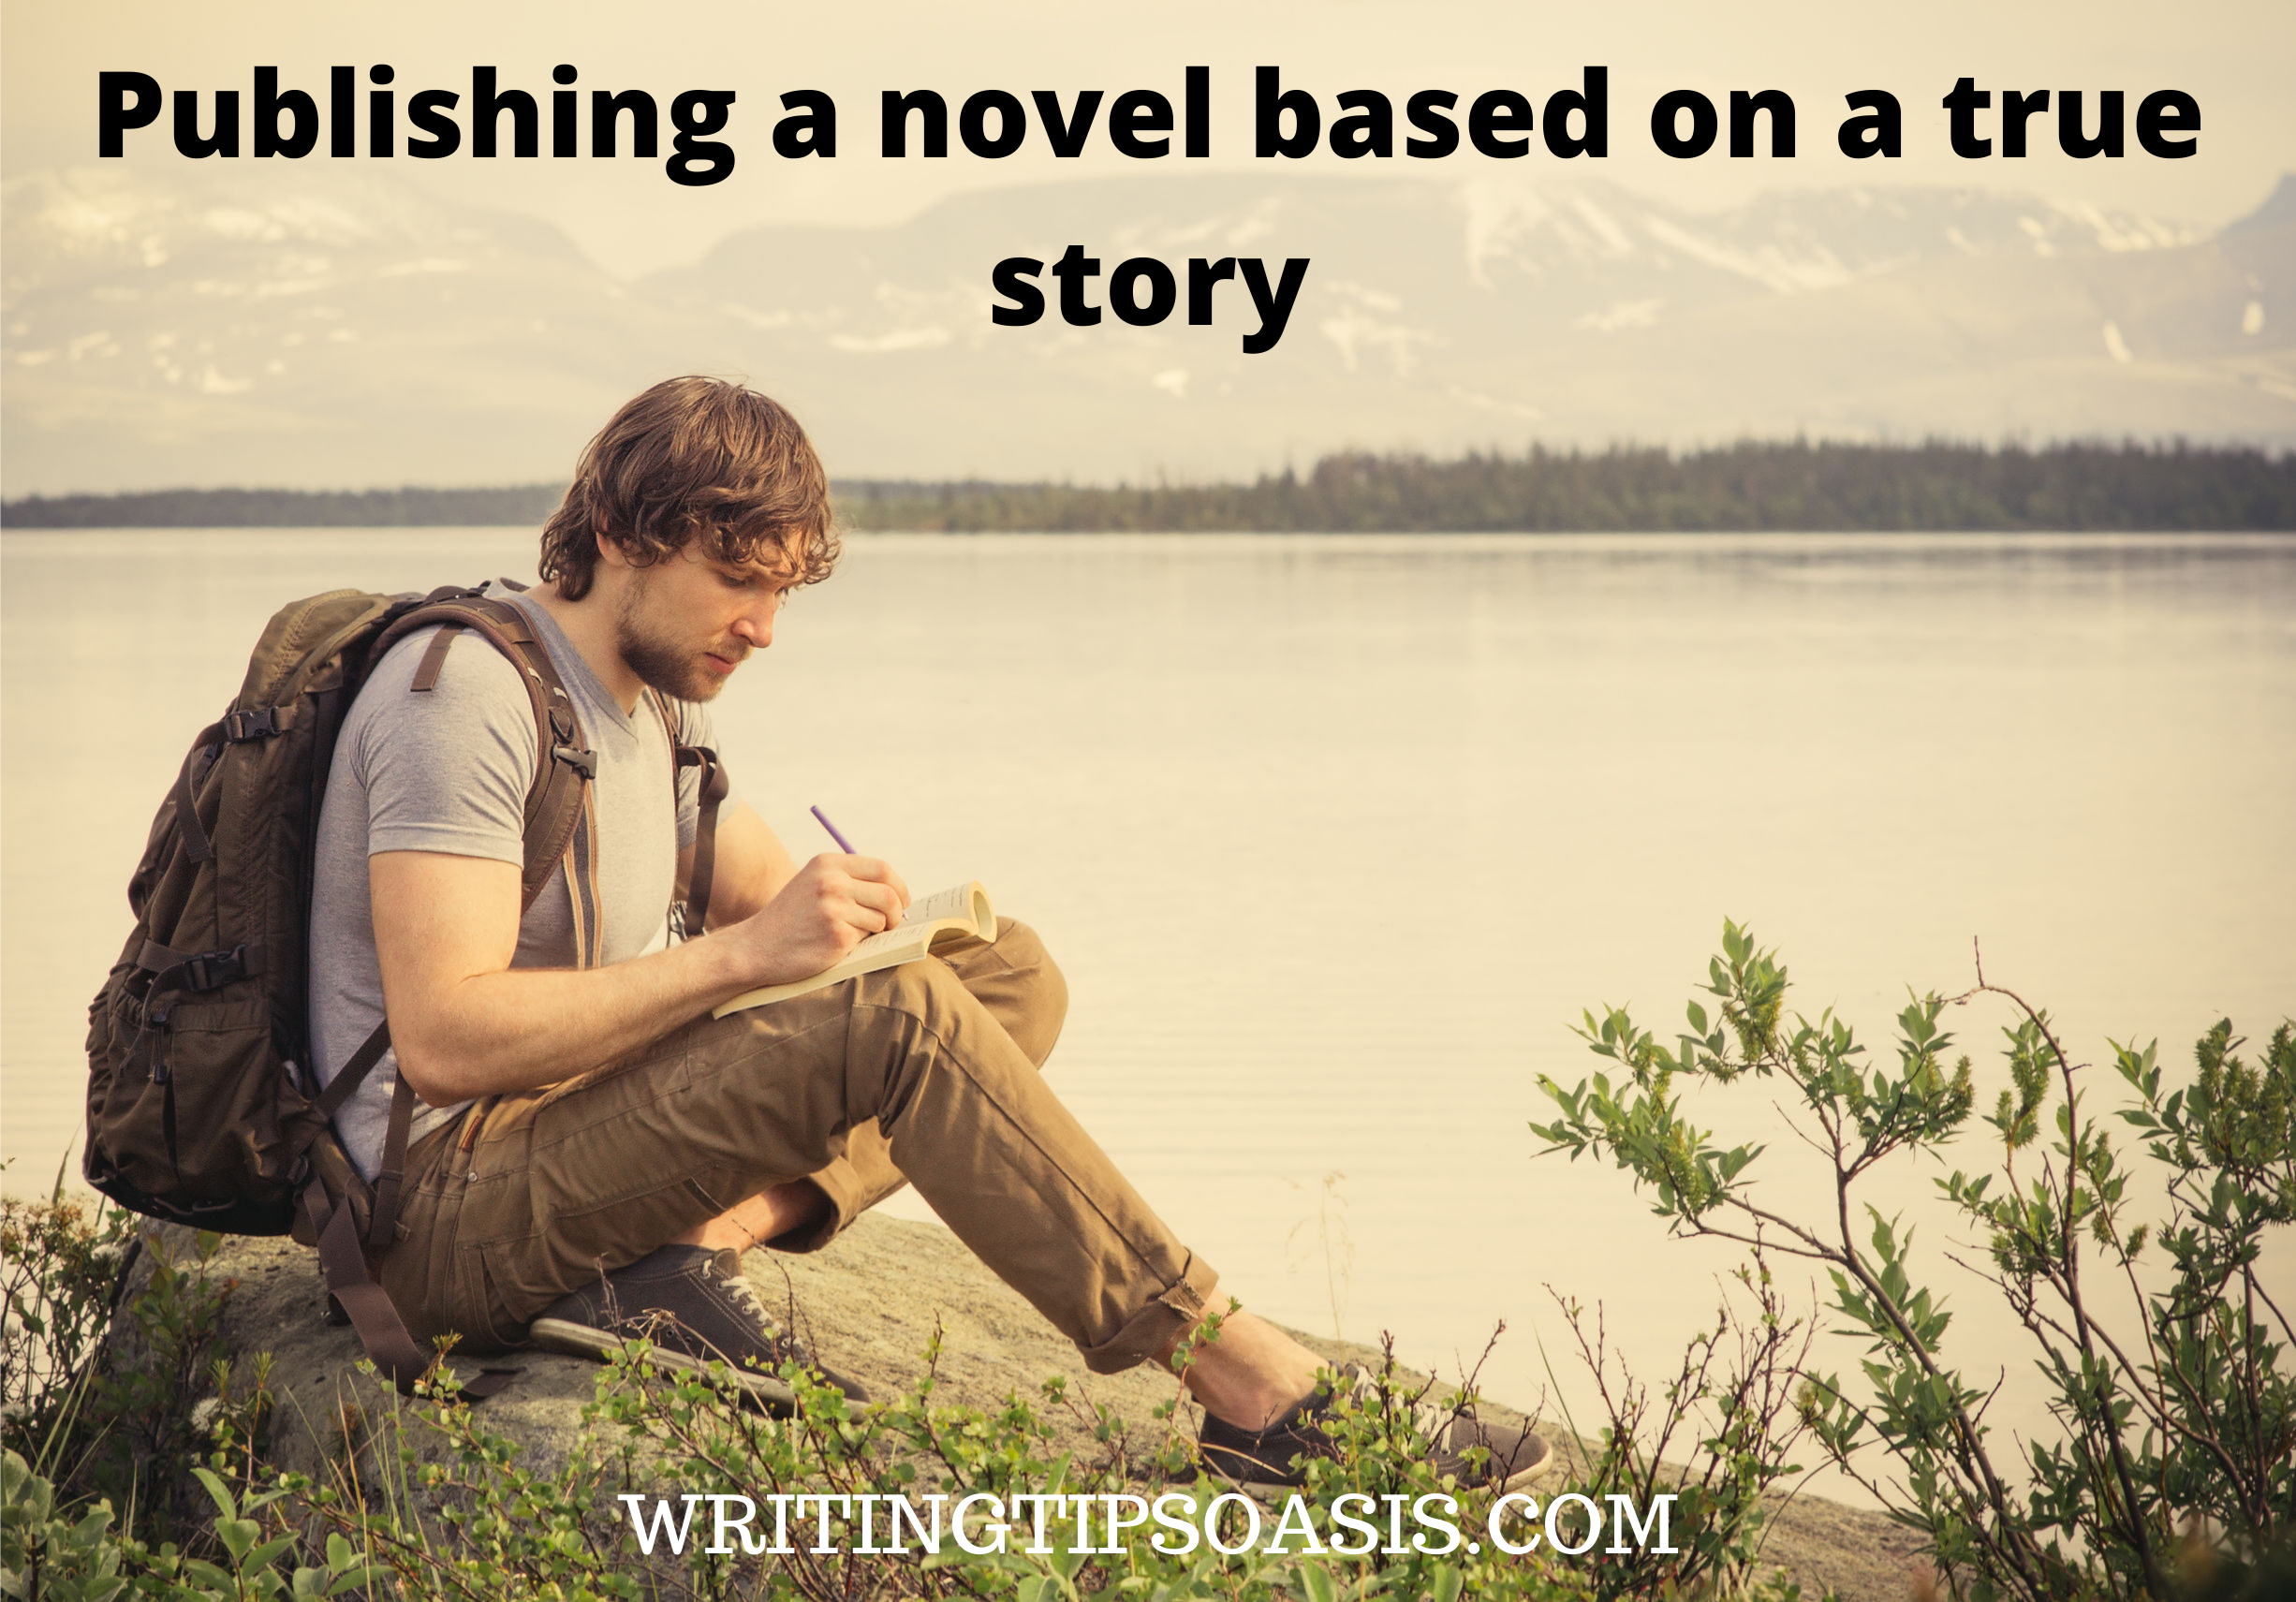 Publishing a novel based on a true story